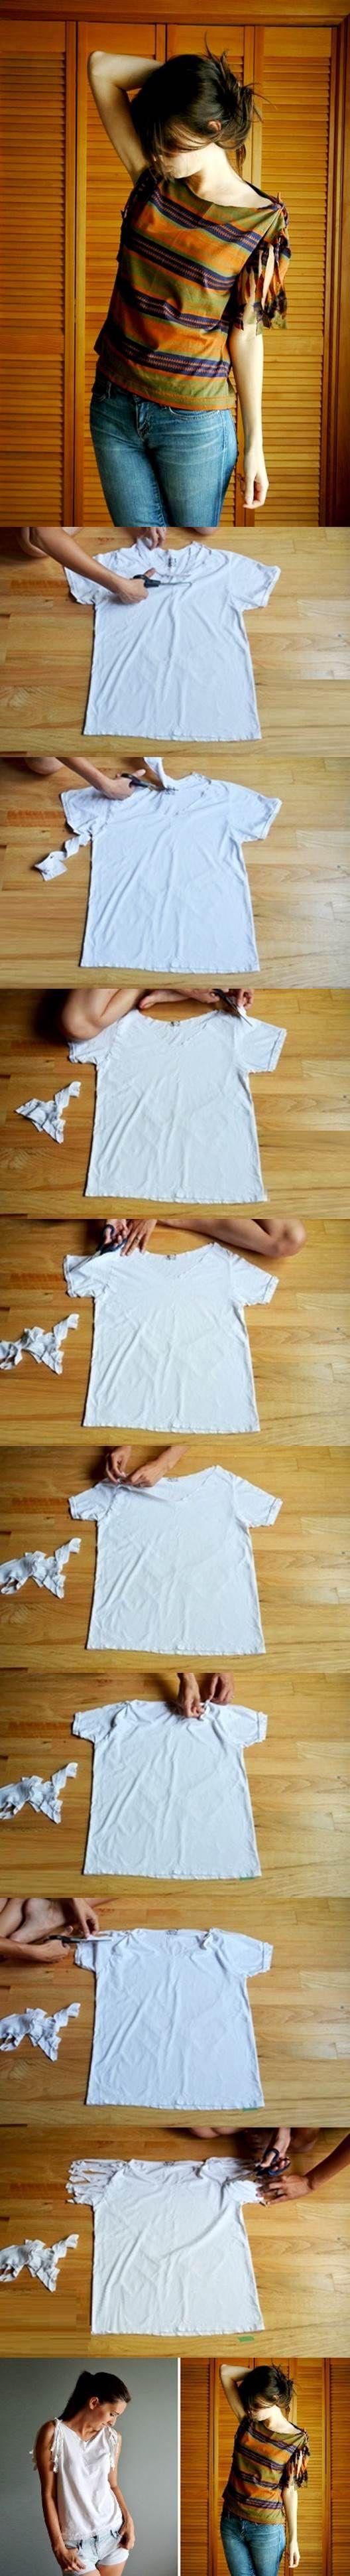 DIY No-Sew Refashion a Basic Tee | iCreativeIdeas.com Like Us on Facebook ==> https://www.facebook.com/icreativeideas